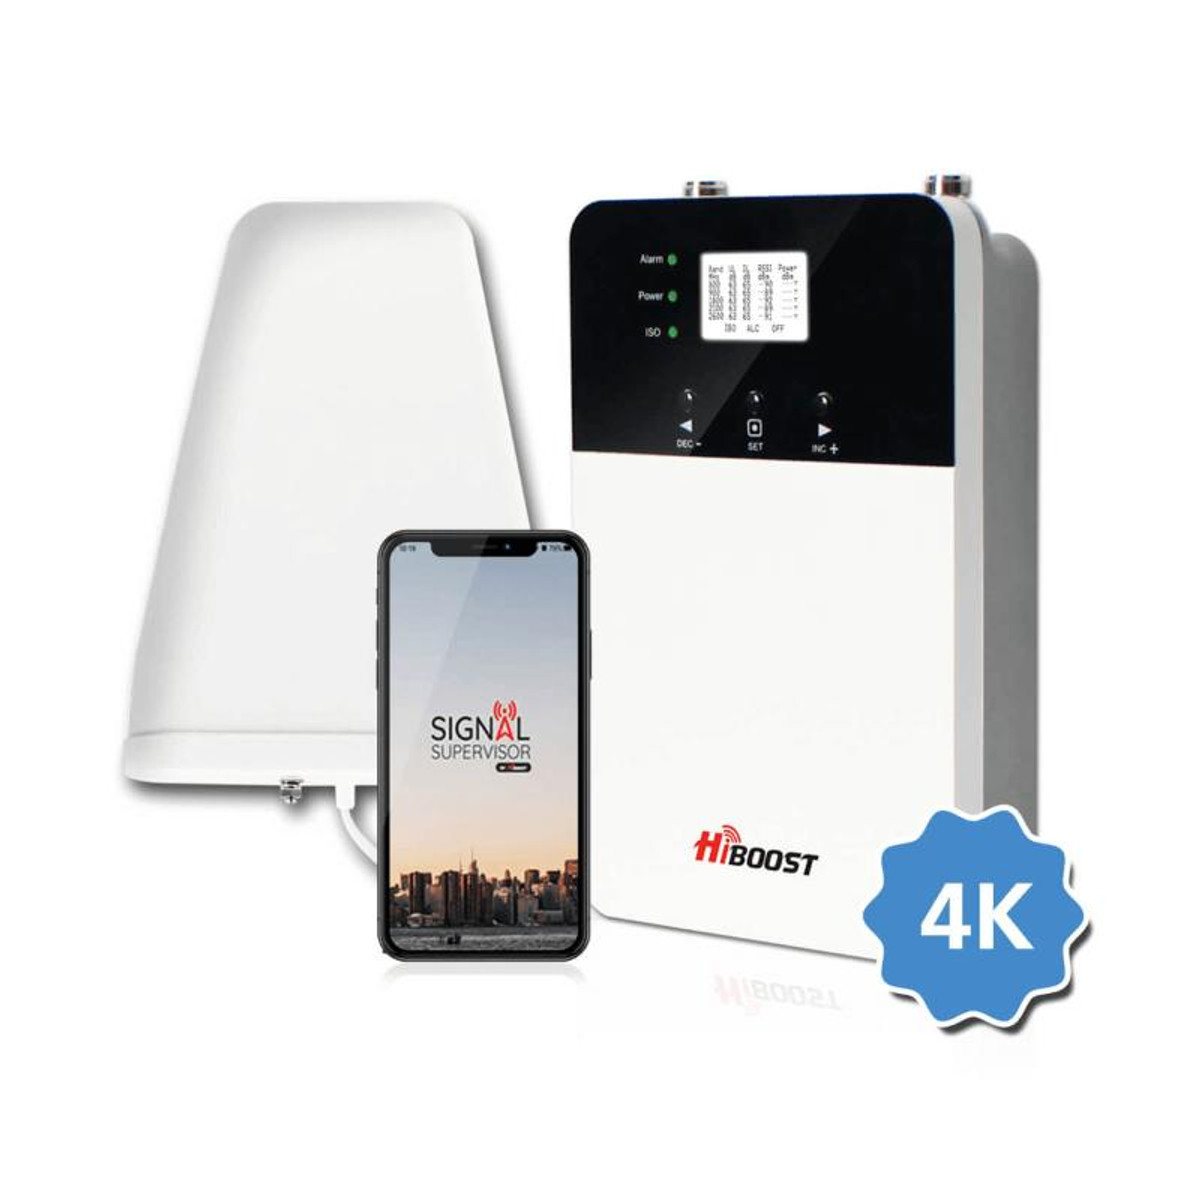 HiBoost HiBoost Home 4K Plus Signal Booster Kit